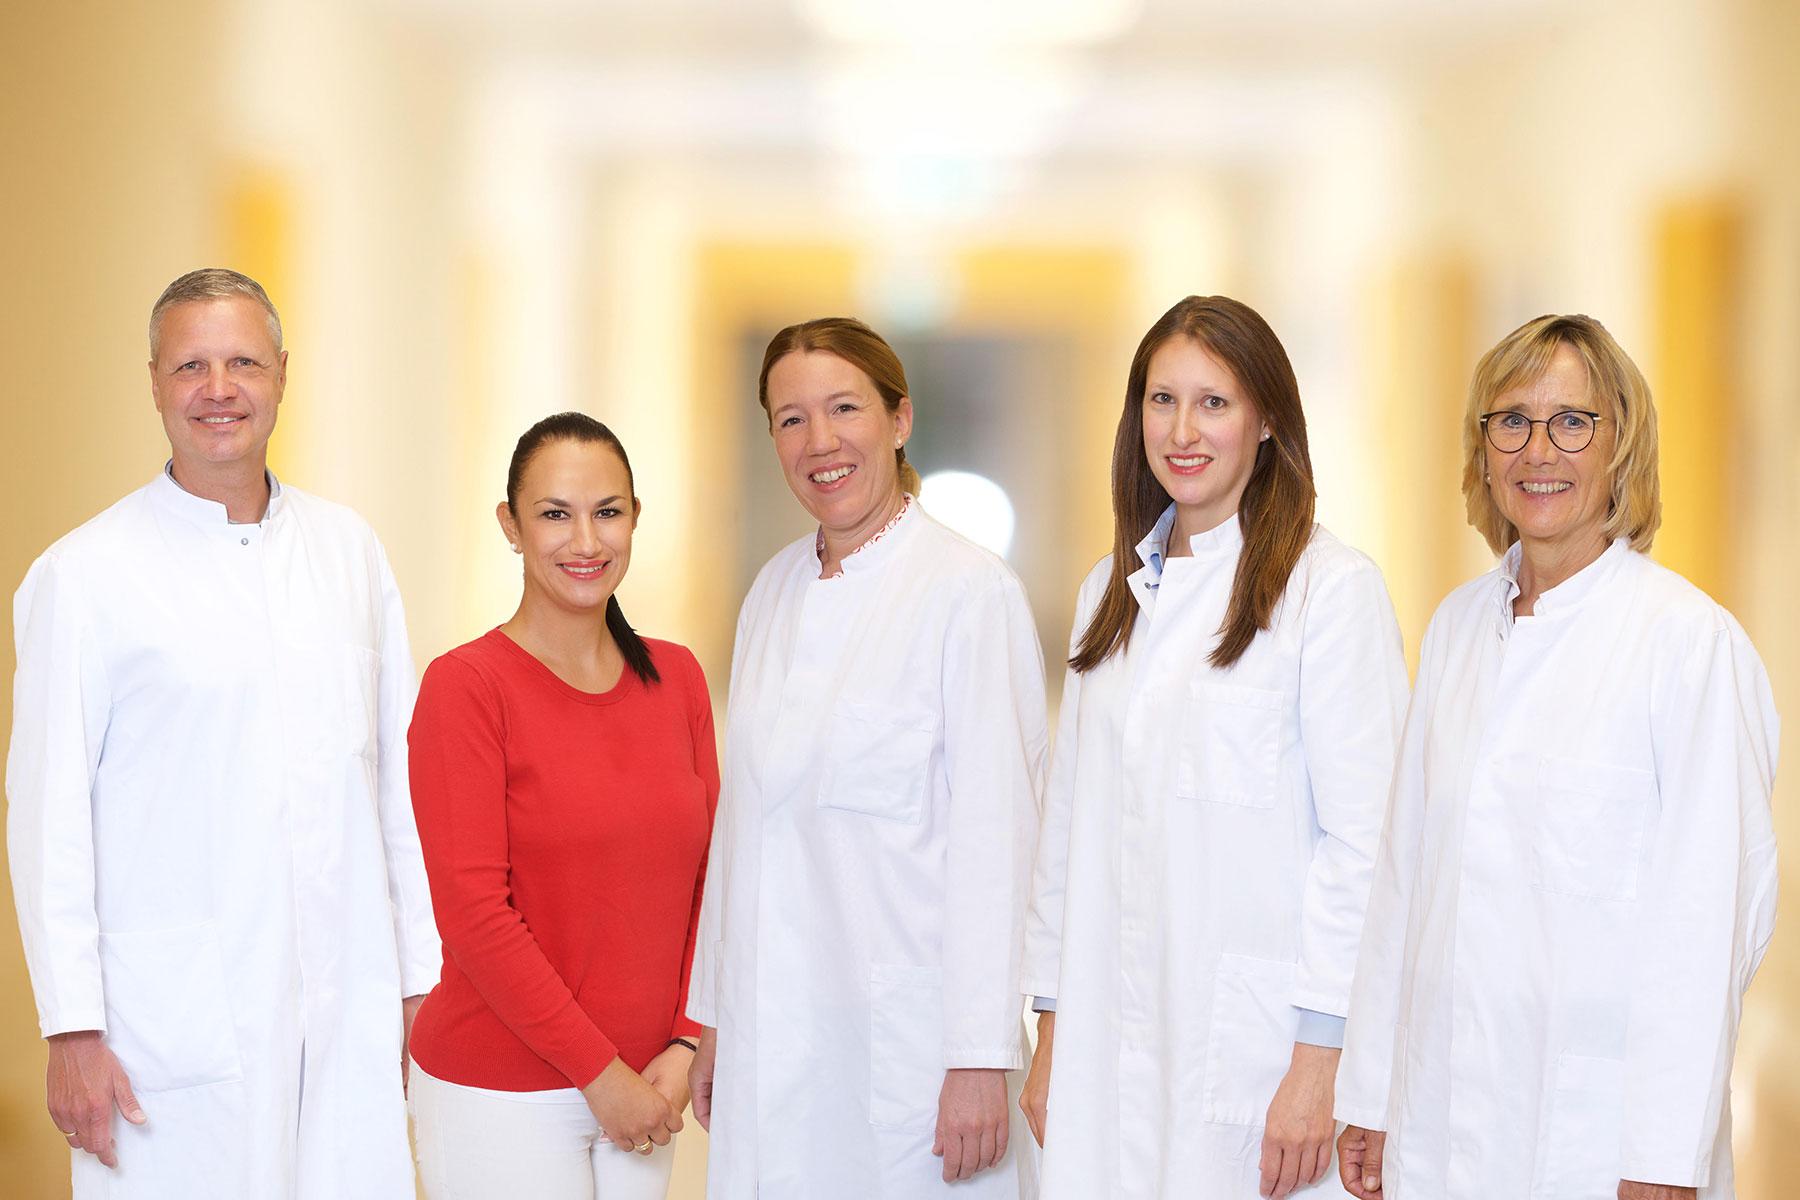 Team des Adipositaszentrum in Bonn